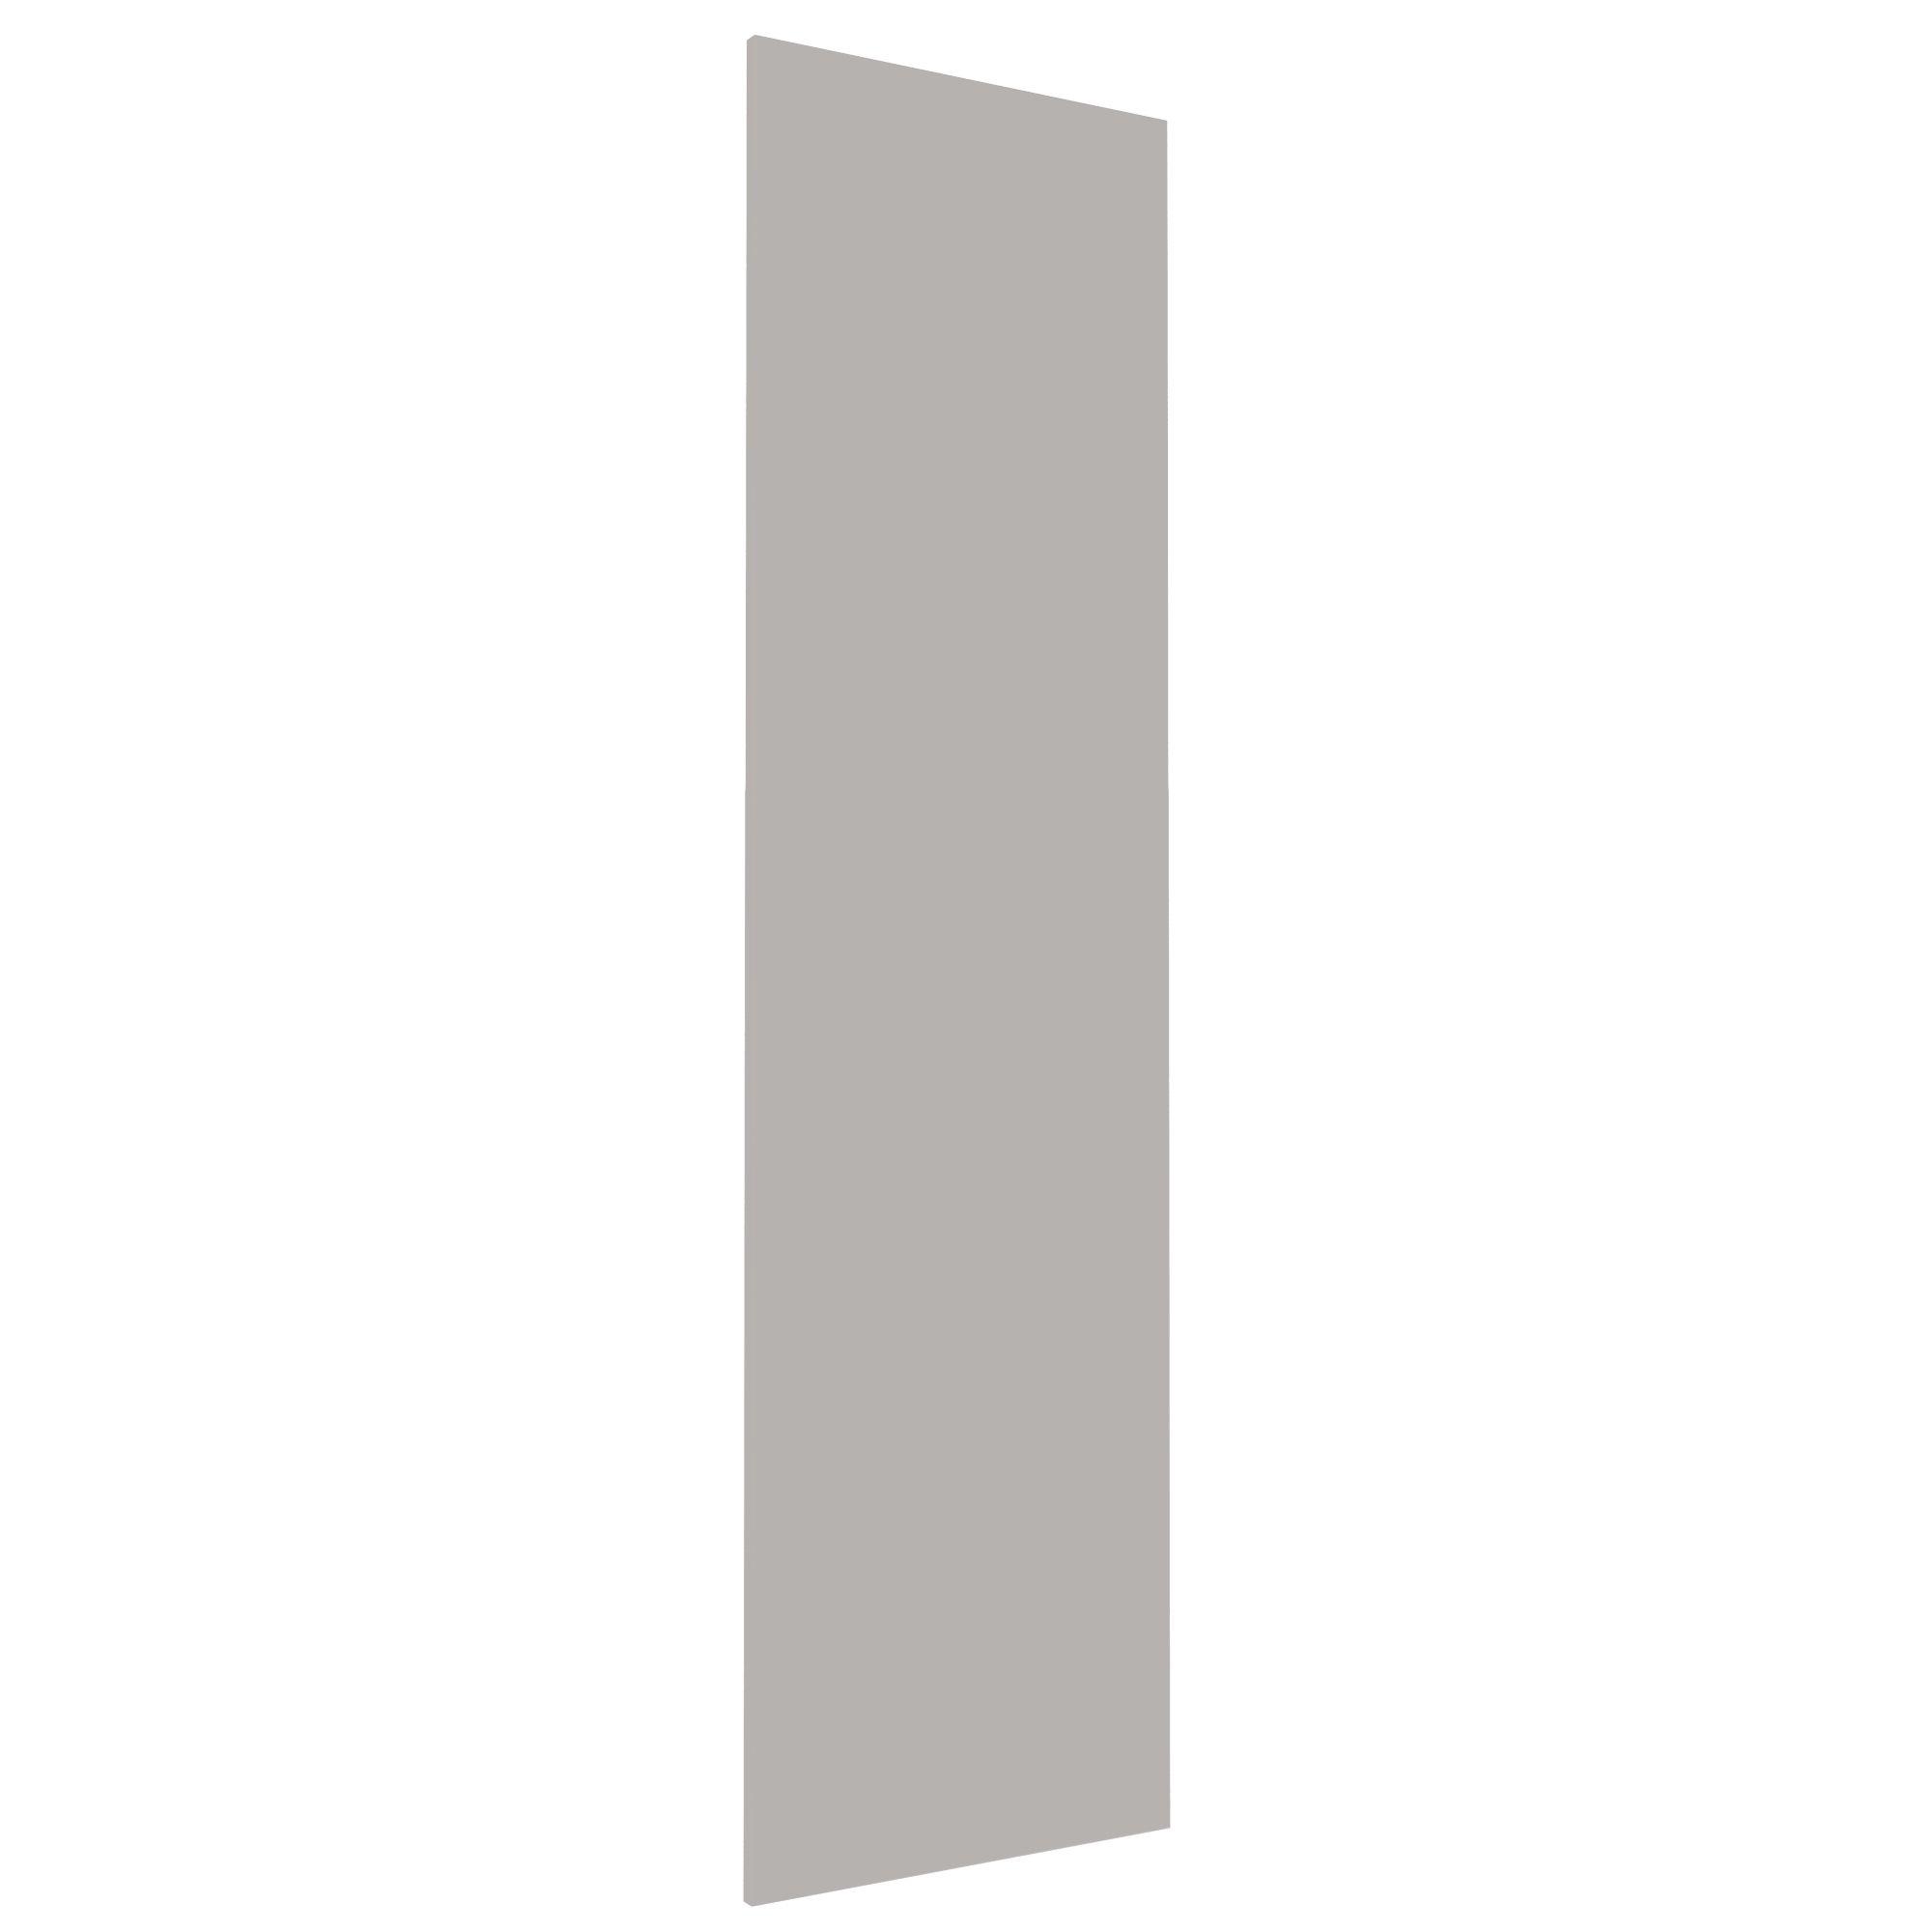 Darwin Modular Grey & Matt Wardrobe Door (h)1808mm (w)497mm (d)16mm